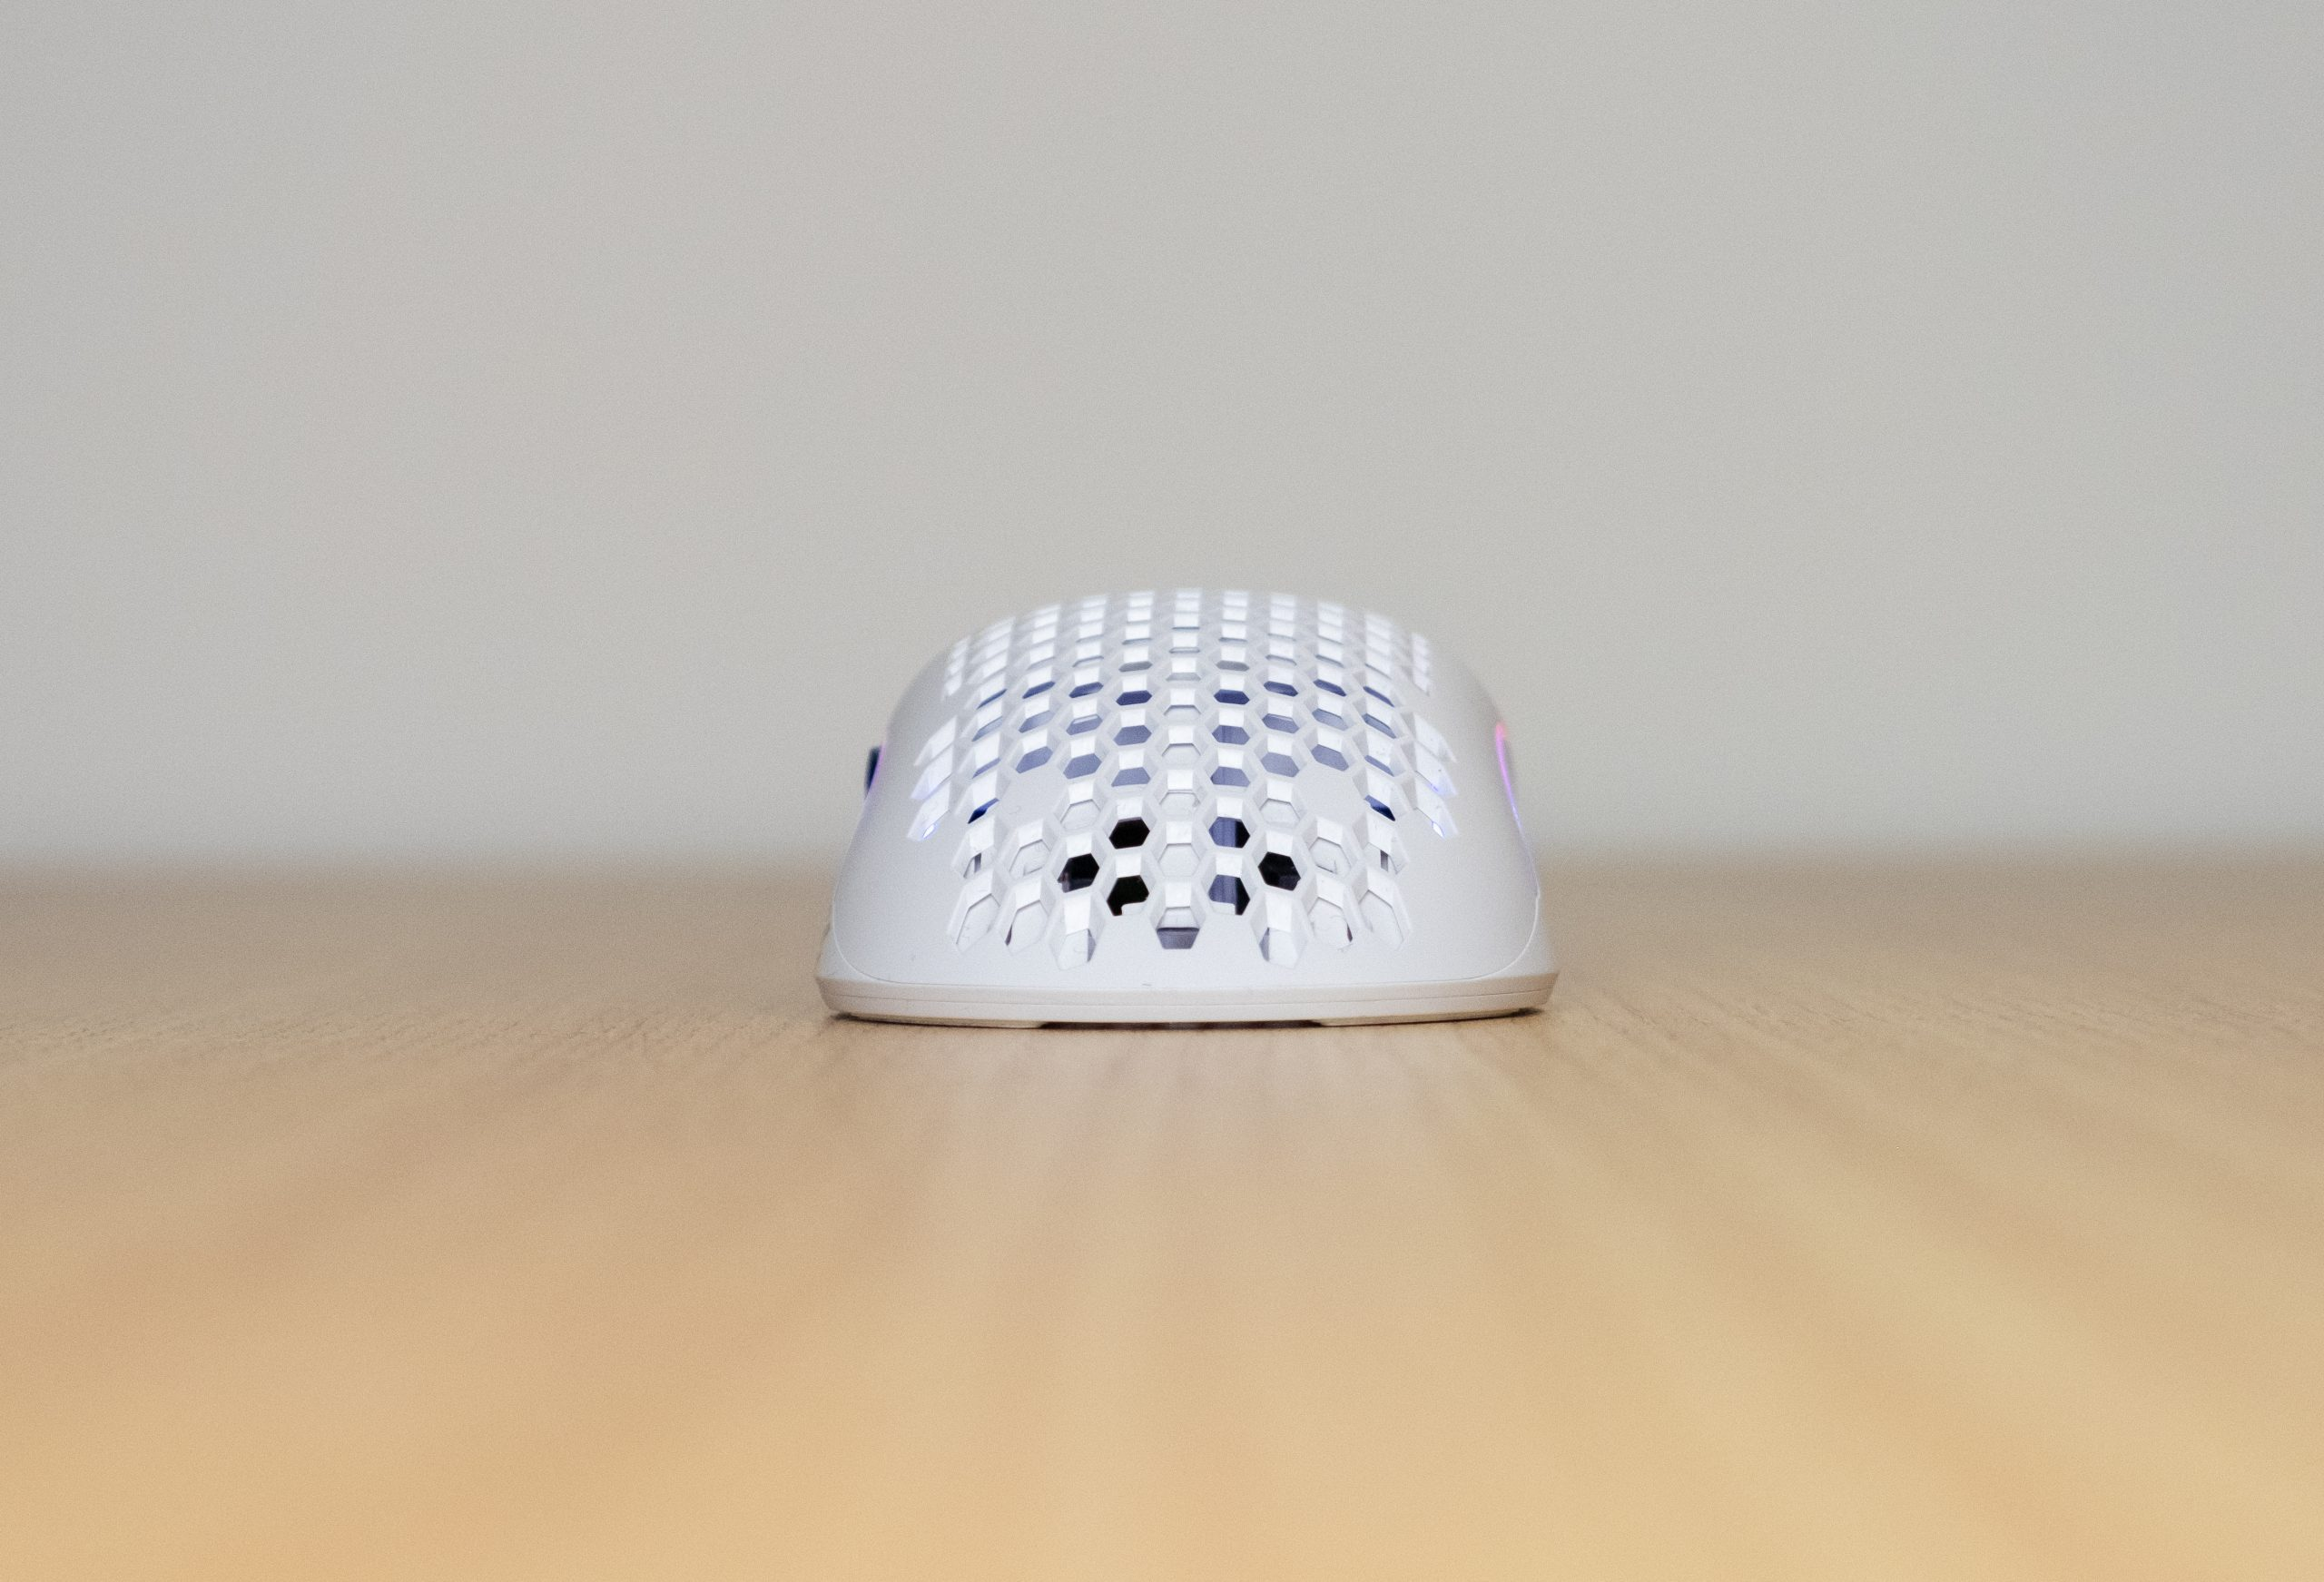 Glorious Model O Wireless - Back